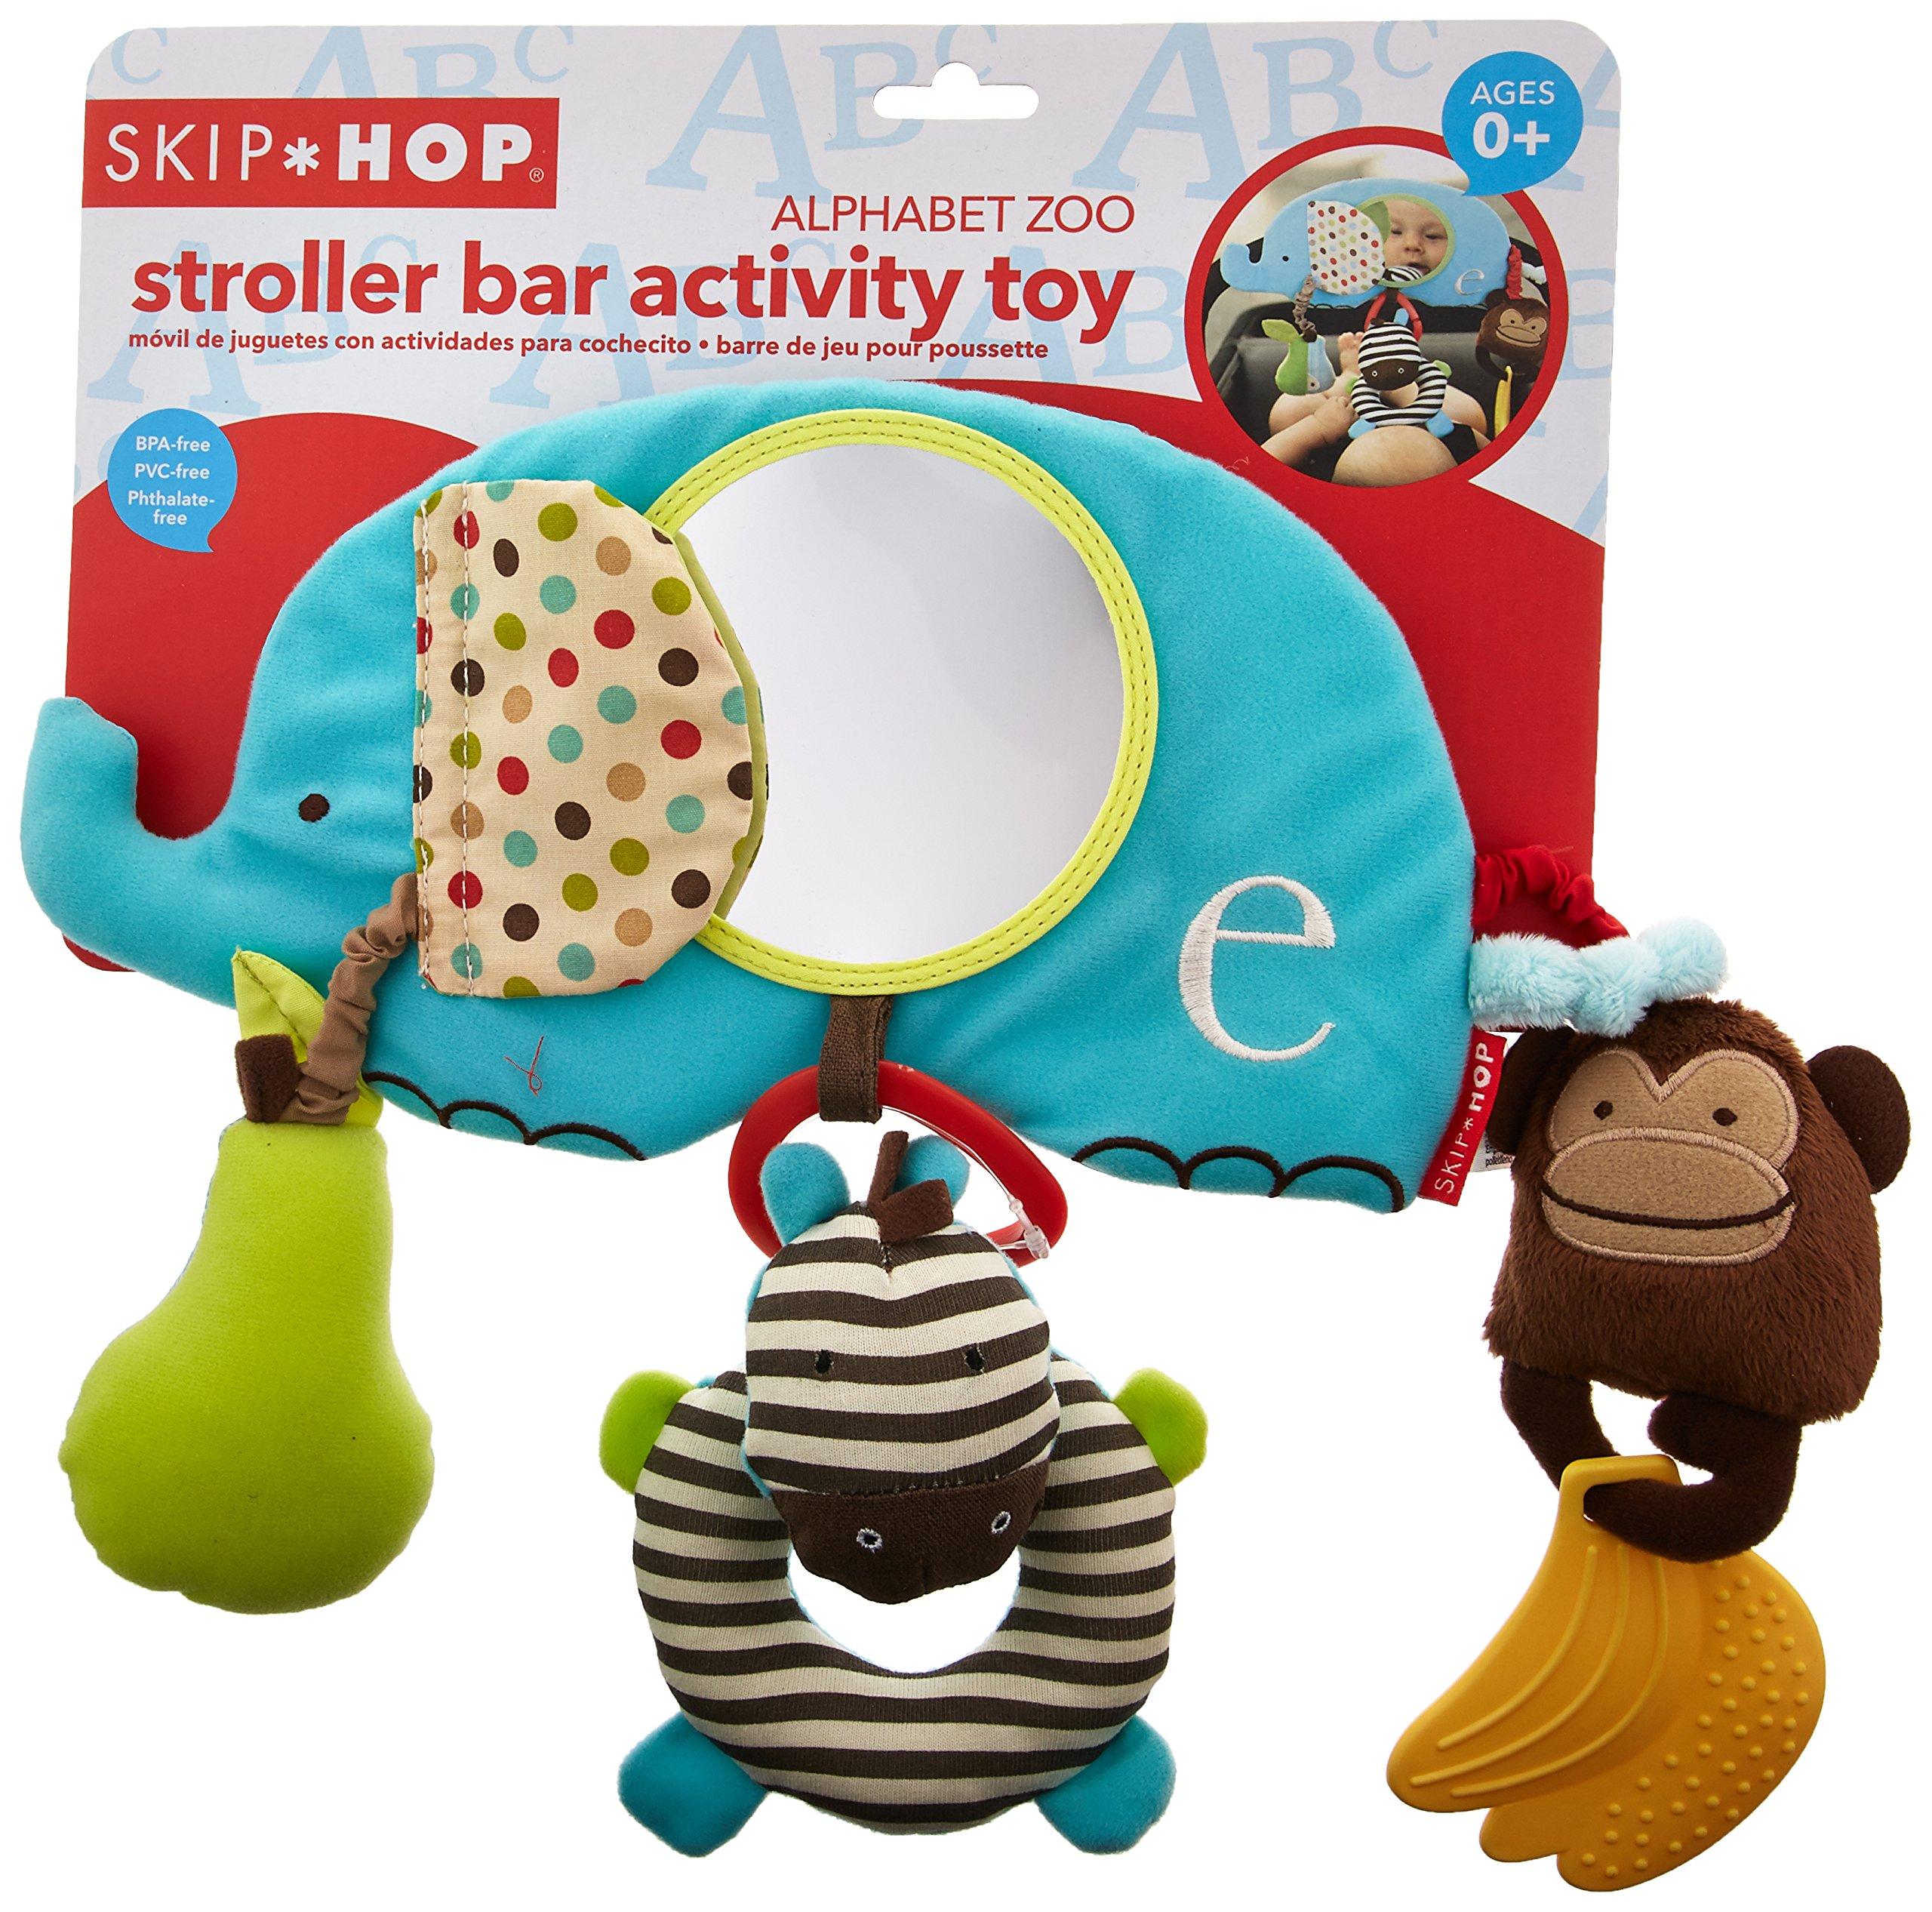 Skip Hop Alphabet Zoo Stroller Bar Activity Toy, Multi by Skip Hop (Image #2)